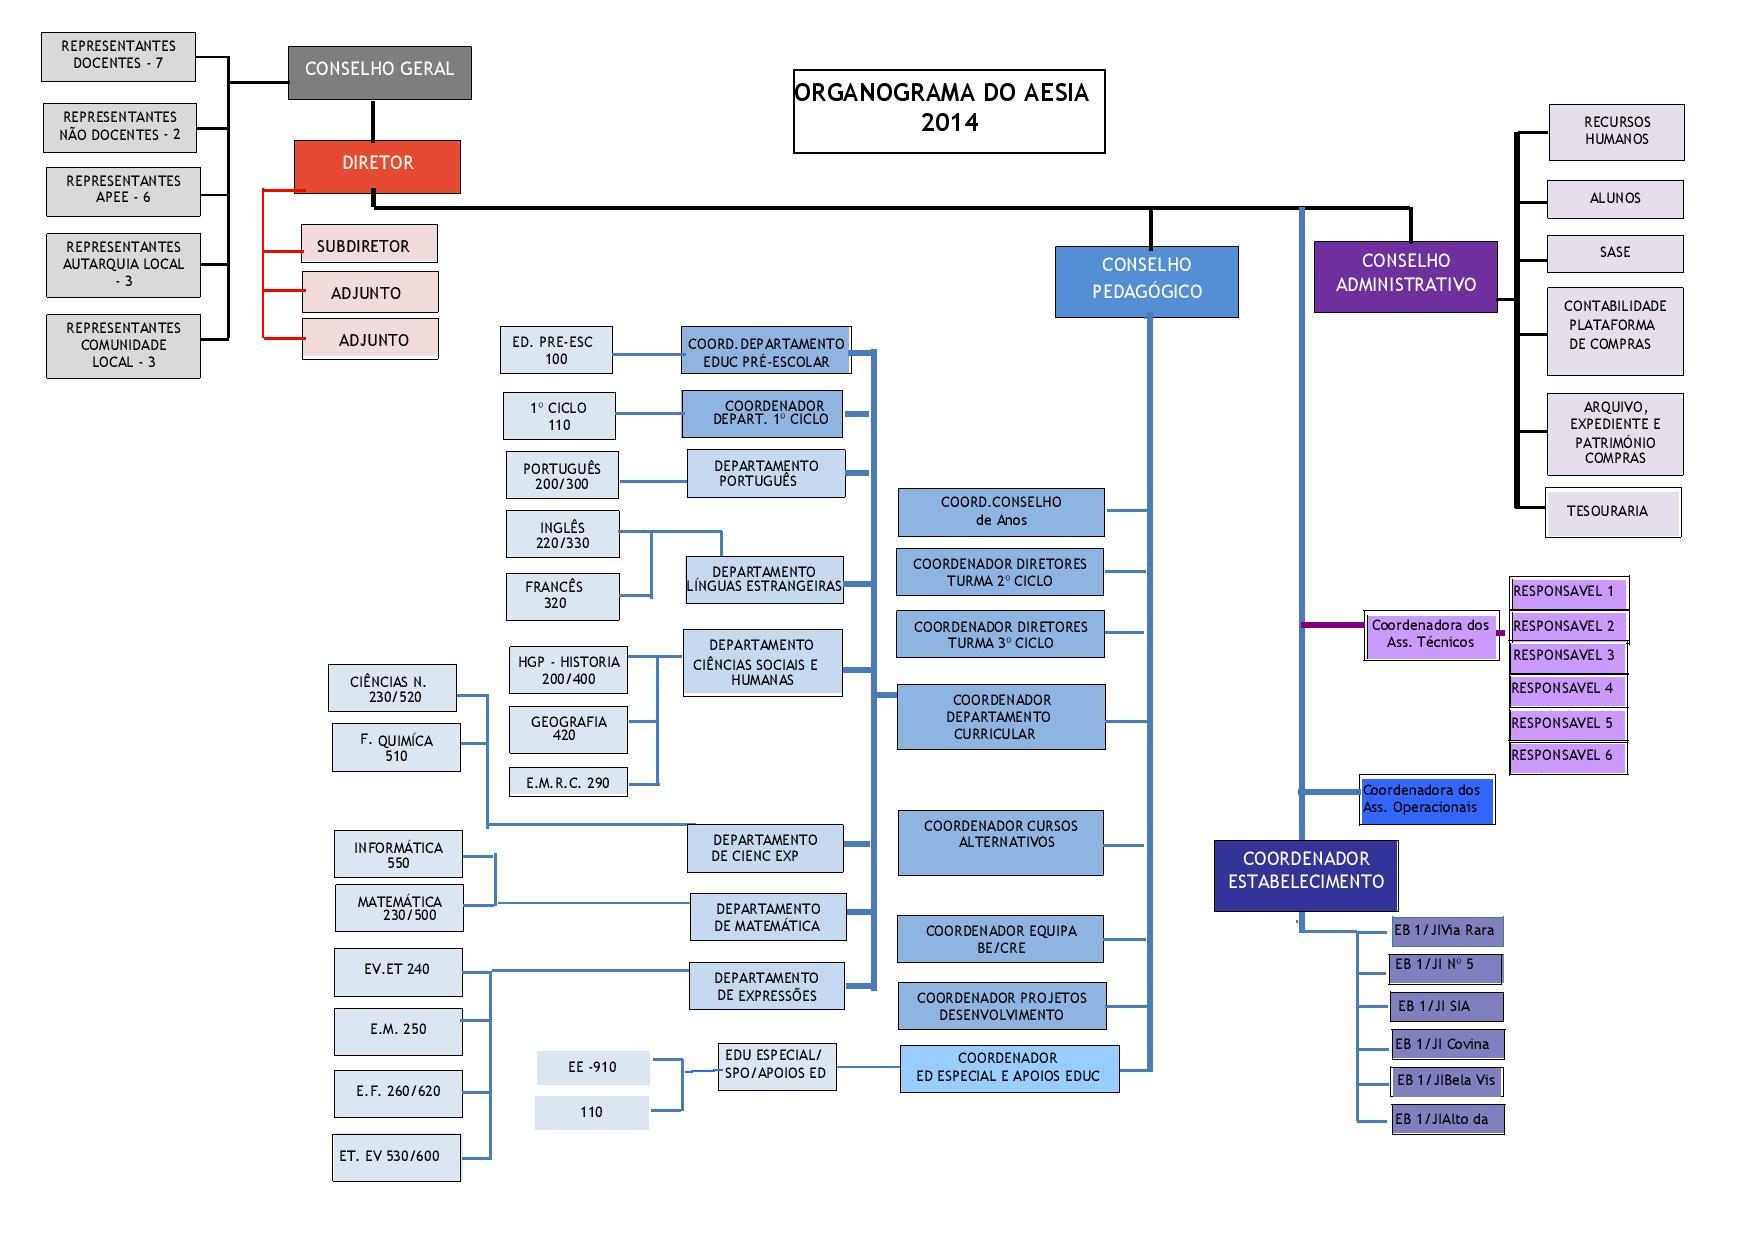 Organigrama AESIA 2014-page-001